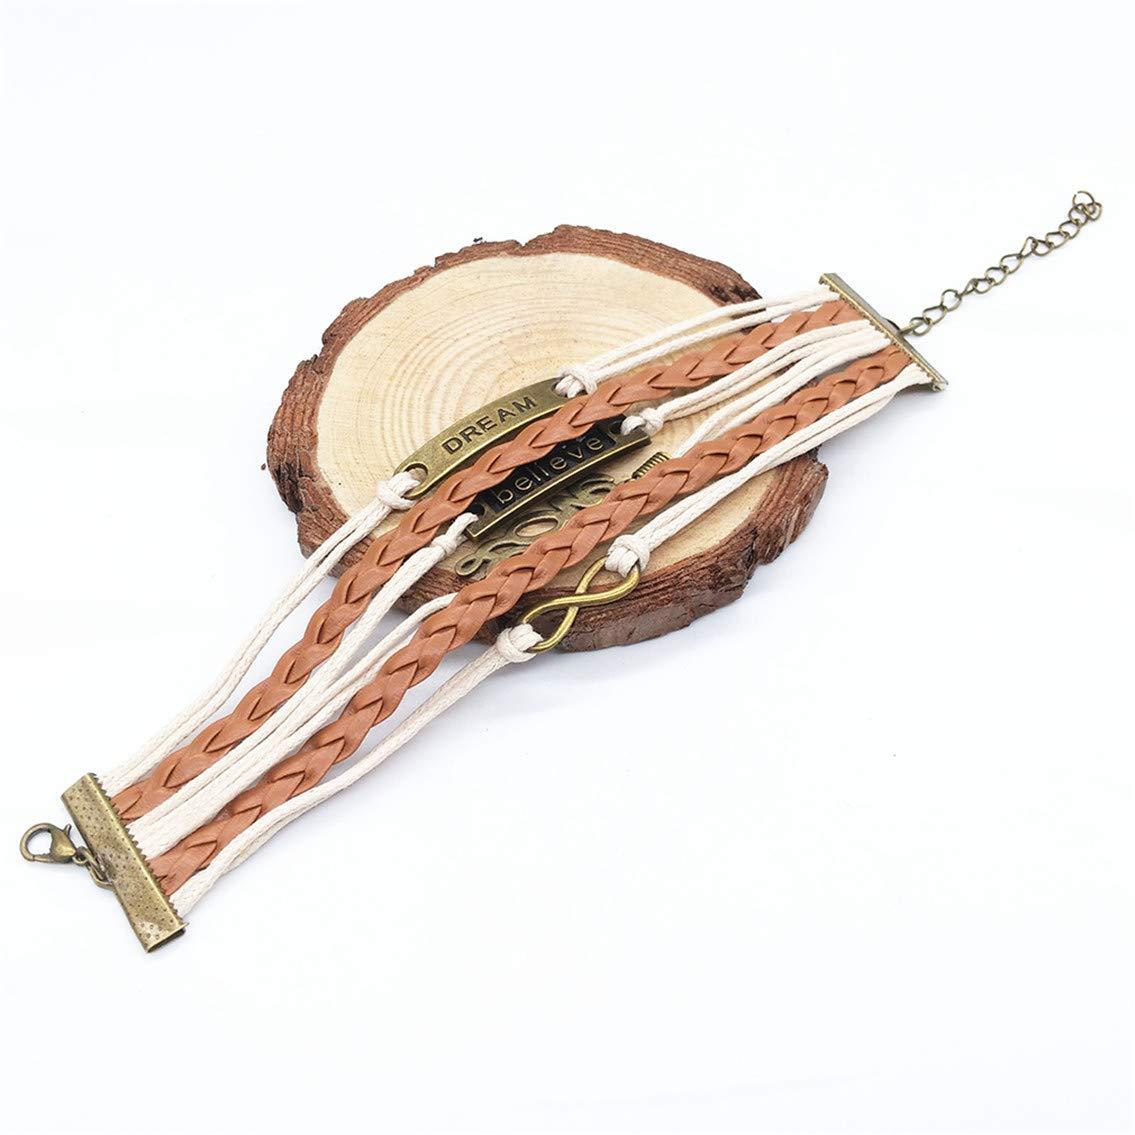 NIKOLay Retro Love Dream Bright Leather Rope Hand-Woven Bracelet Temperament Simple Hand Strap